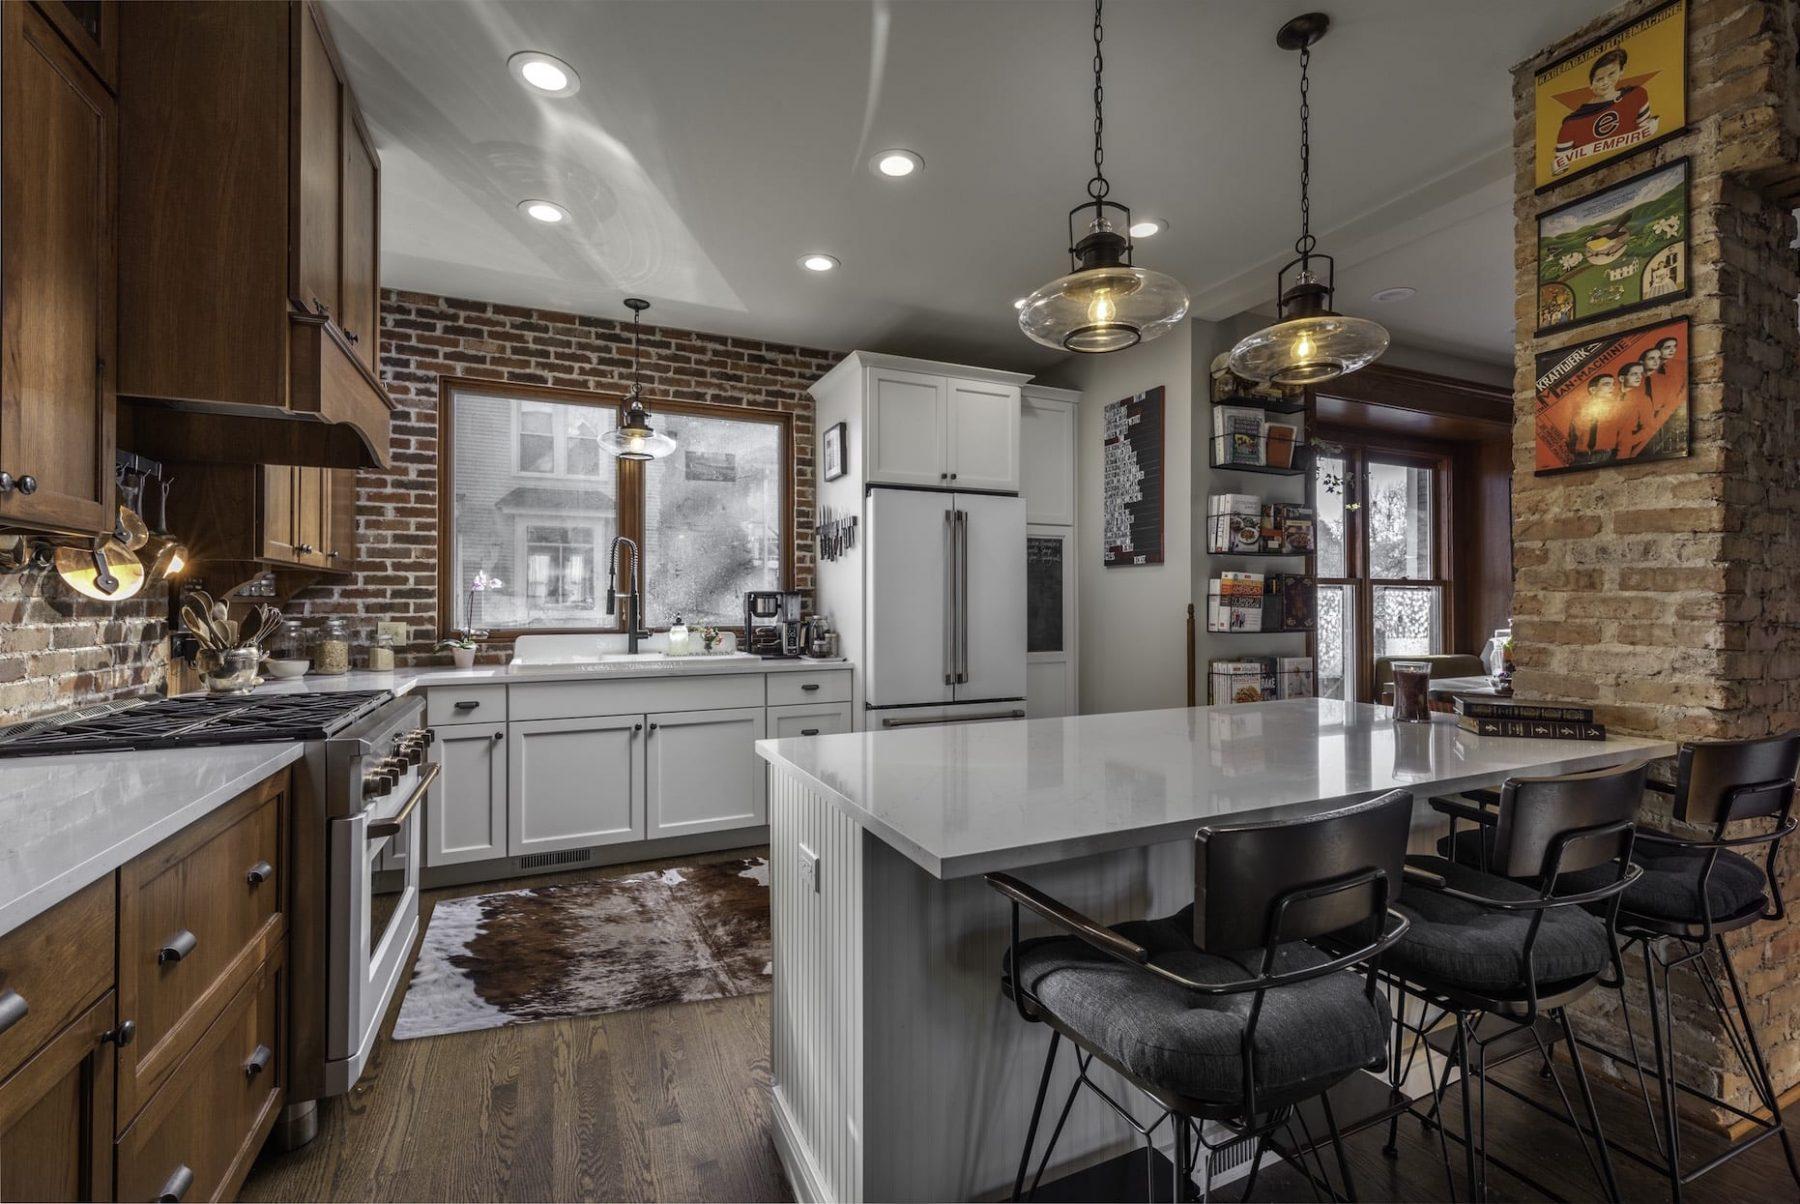 Illinois Kitchen Designer | Kitchen Furnishings Design & Build